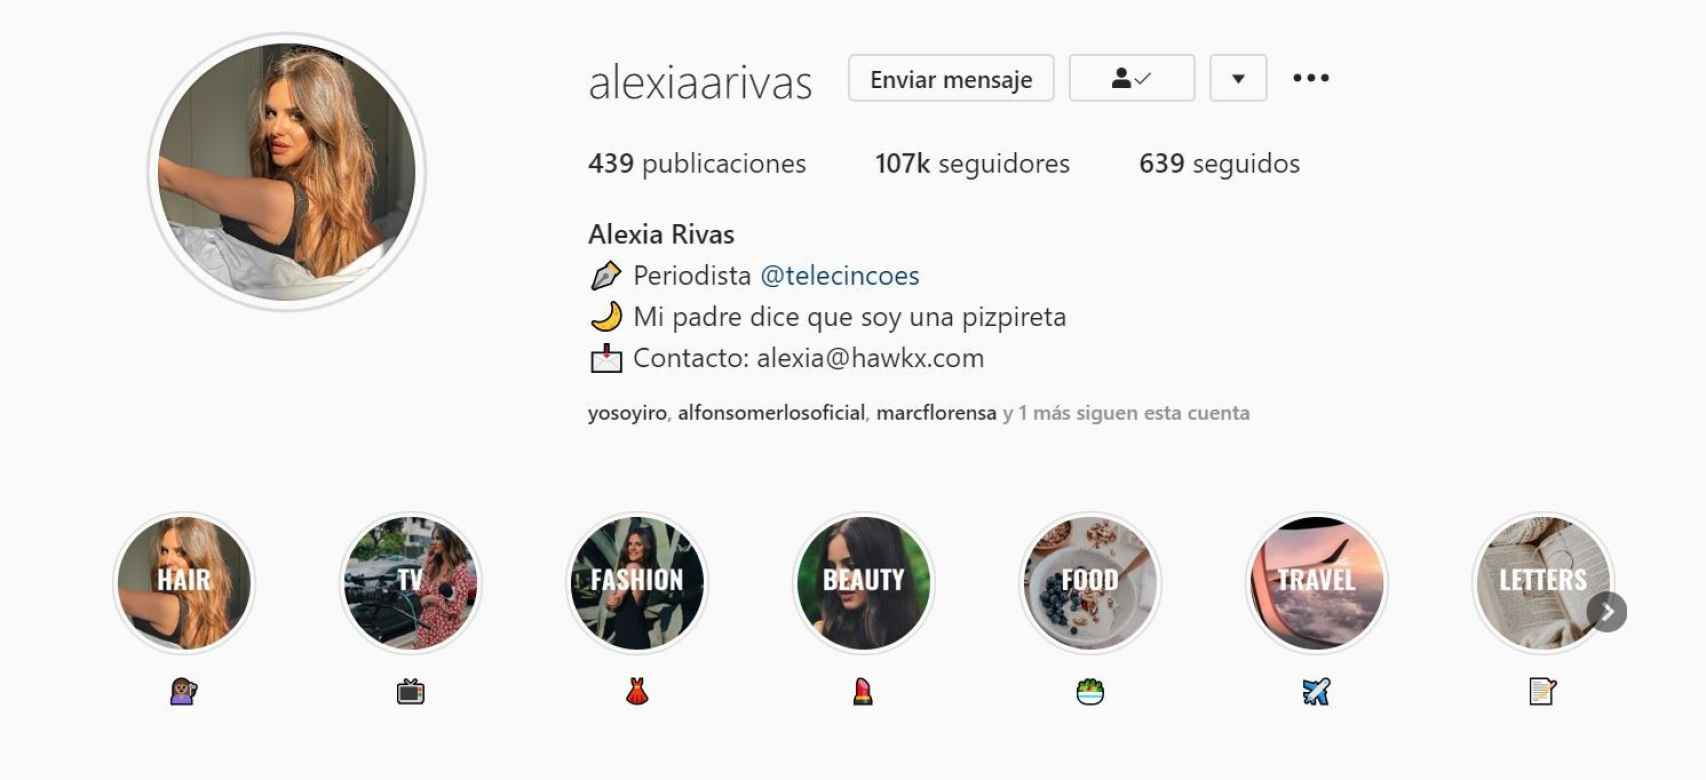 Captura del perfil de Instagram de Alexia Rivas, que ha quintuplicado sus seguidores.